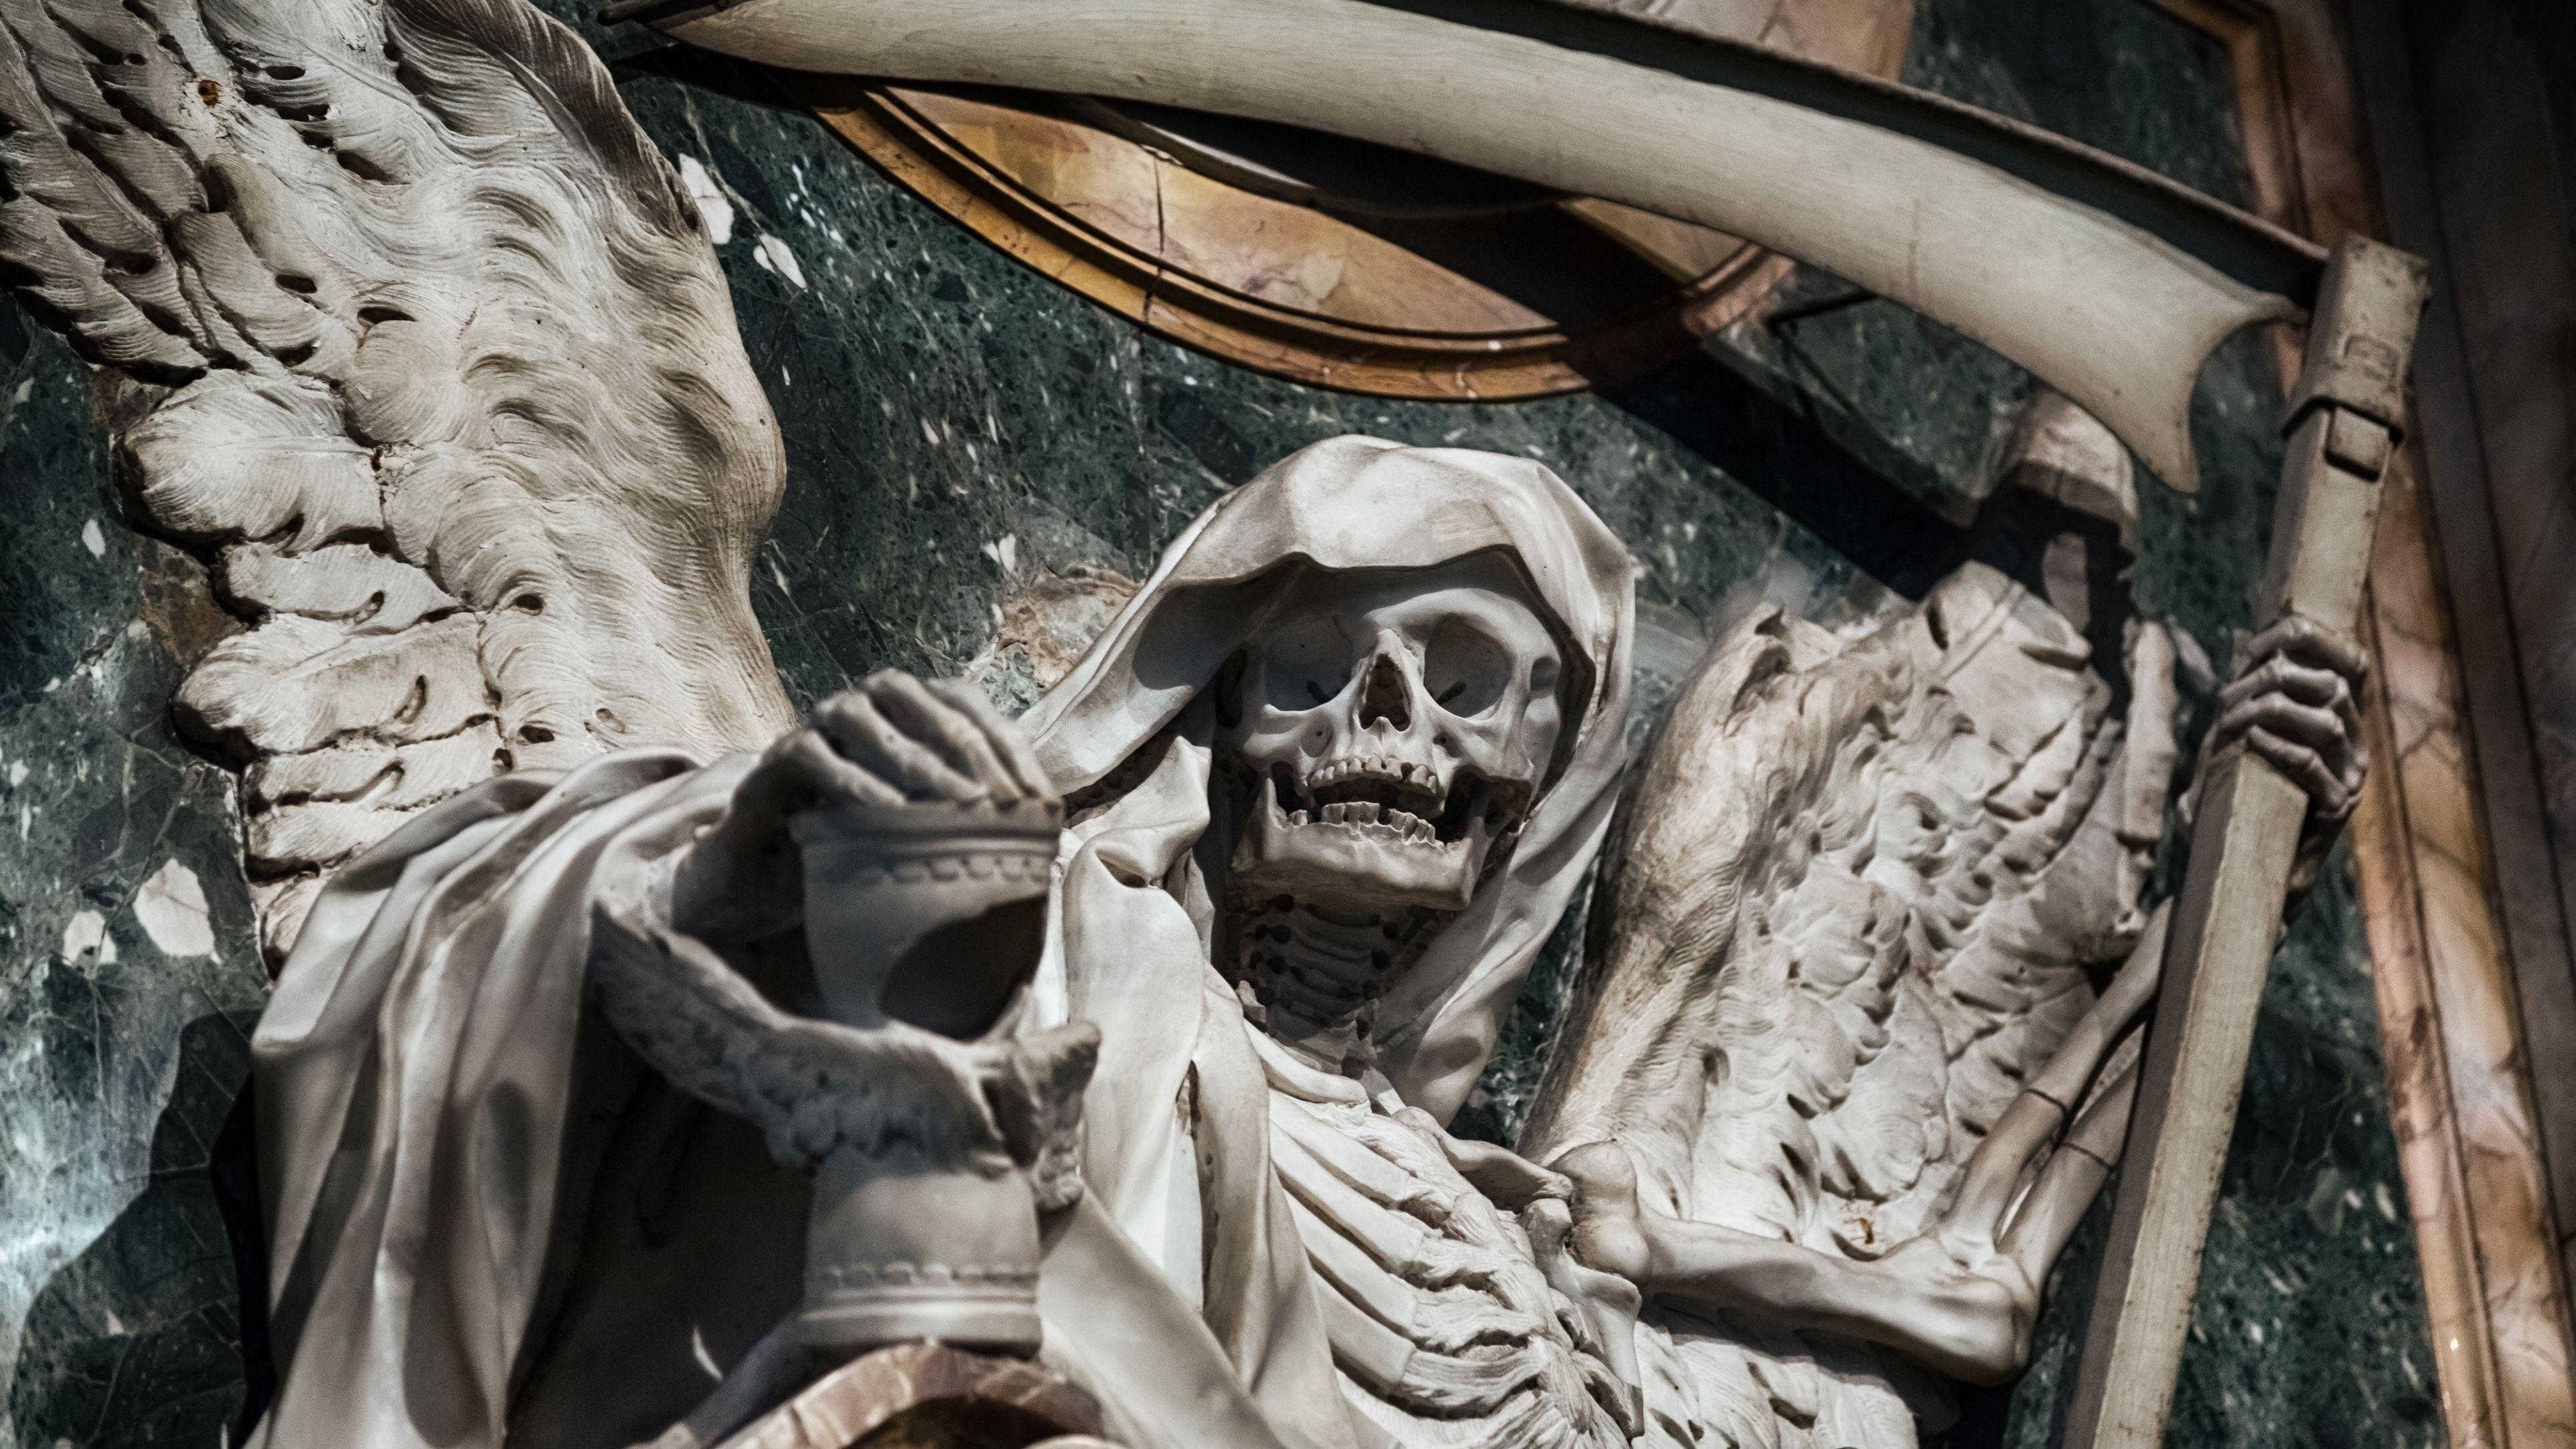 allegory-of-death-640494102-5b71f7d446e0fb002cdf4070